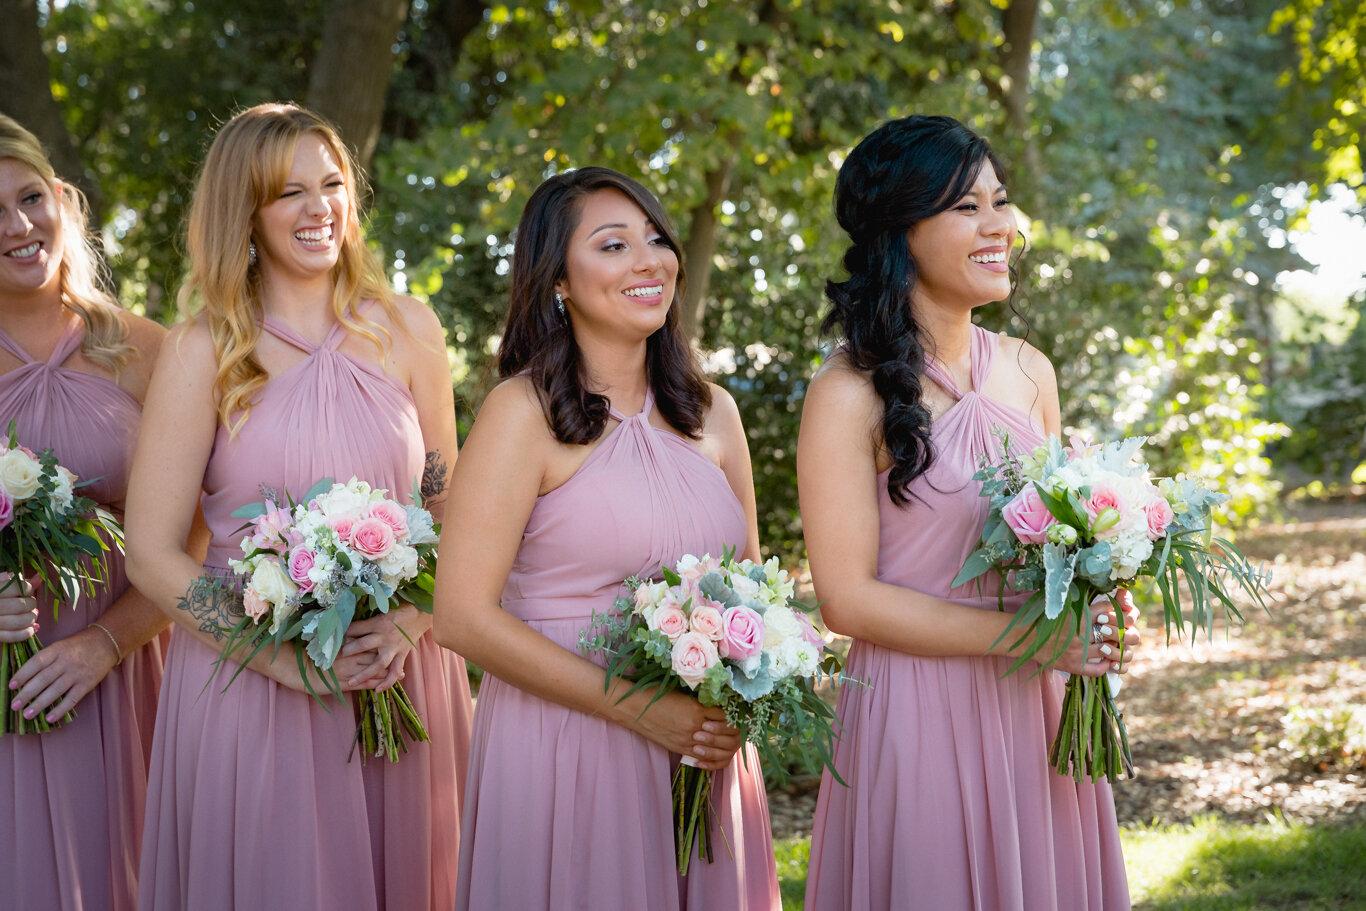 2019.08.24_Emily-Ashir-Wedding-at-the-Maples-5824.jpg